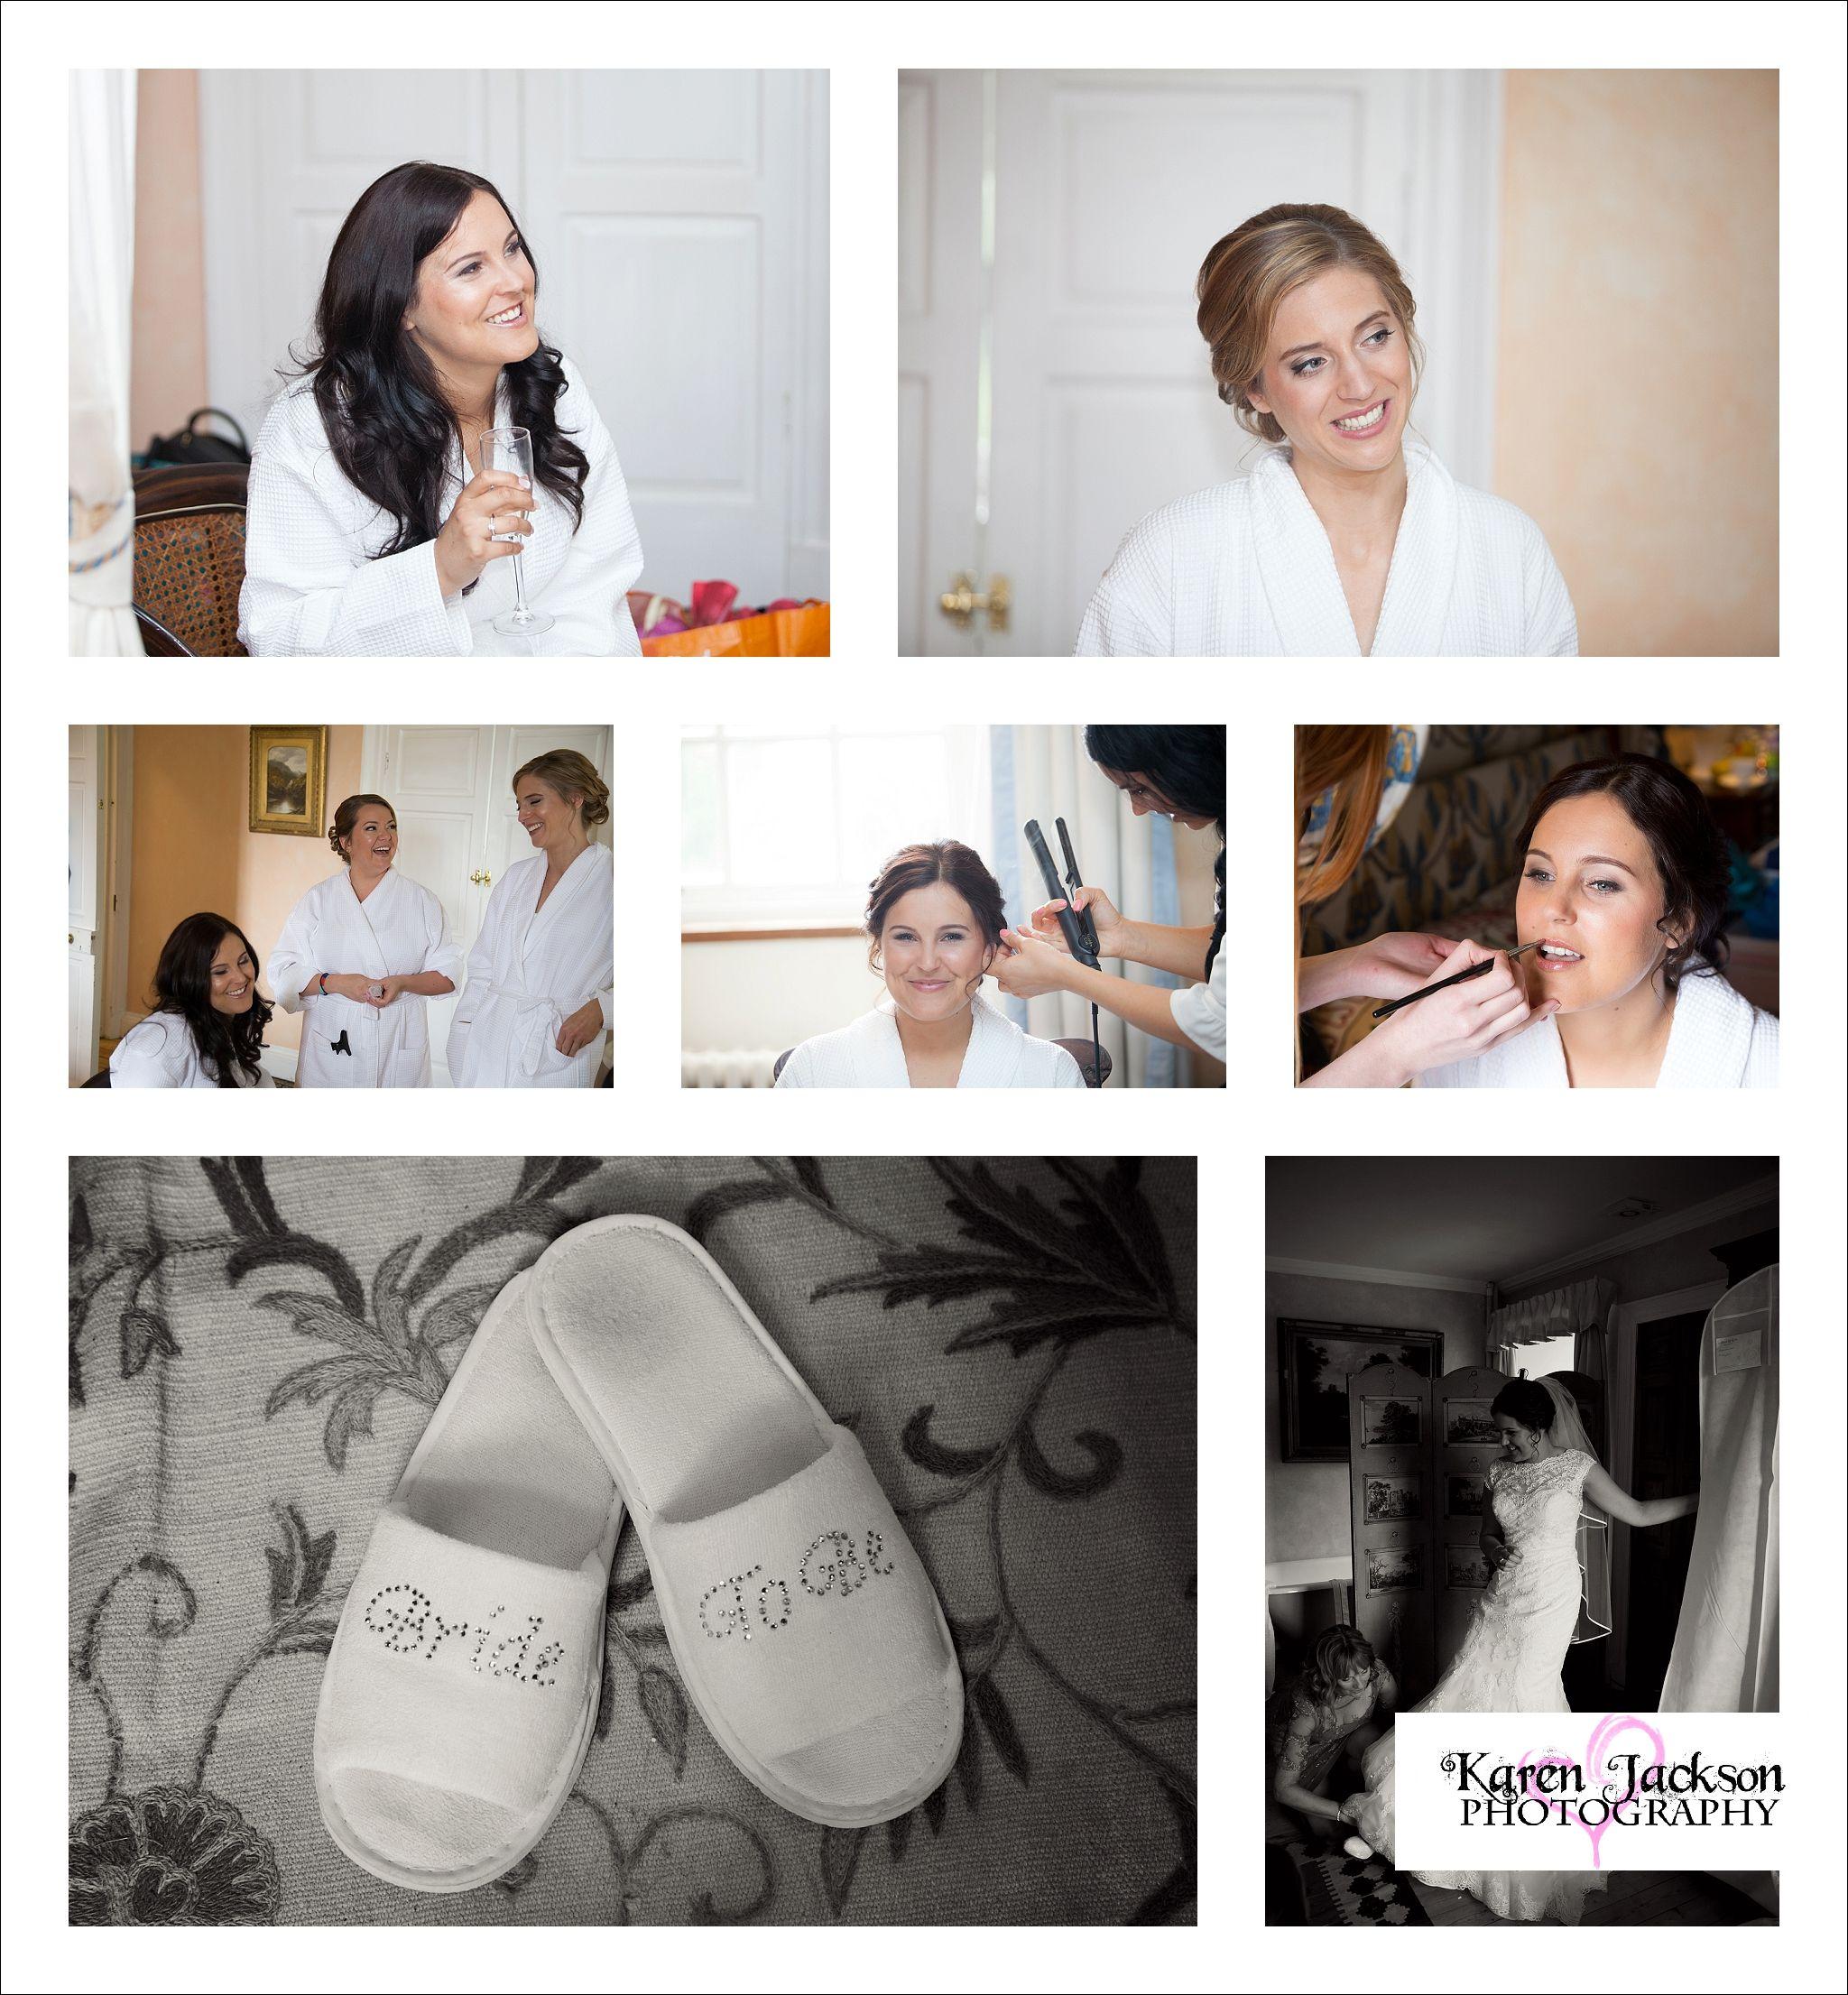 Piperdam Wedding Photography Angus Scotland Photographer Dundee Karen Jackson Bridal Prep Getting Ready Dress Shoes Bridesmaids